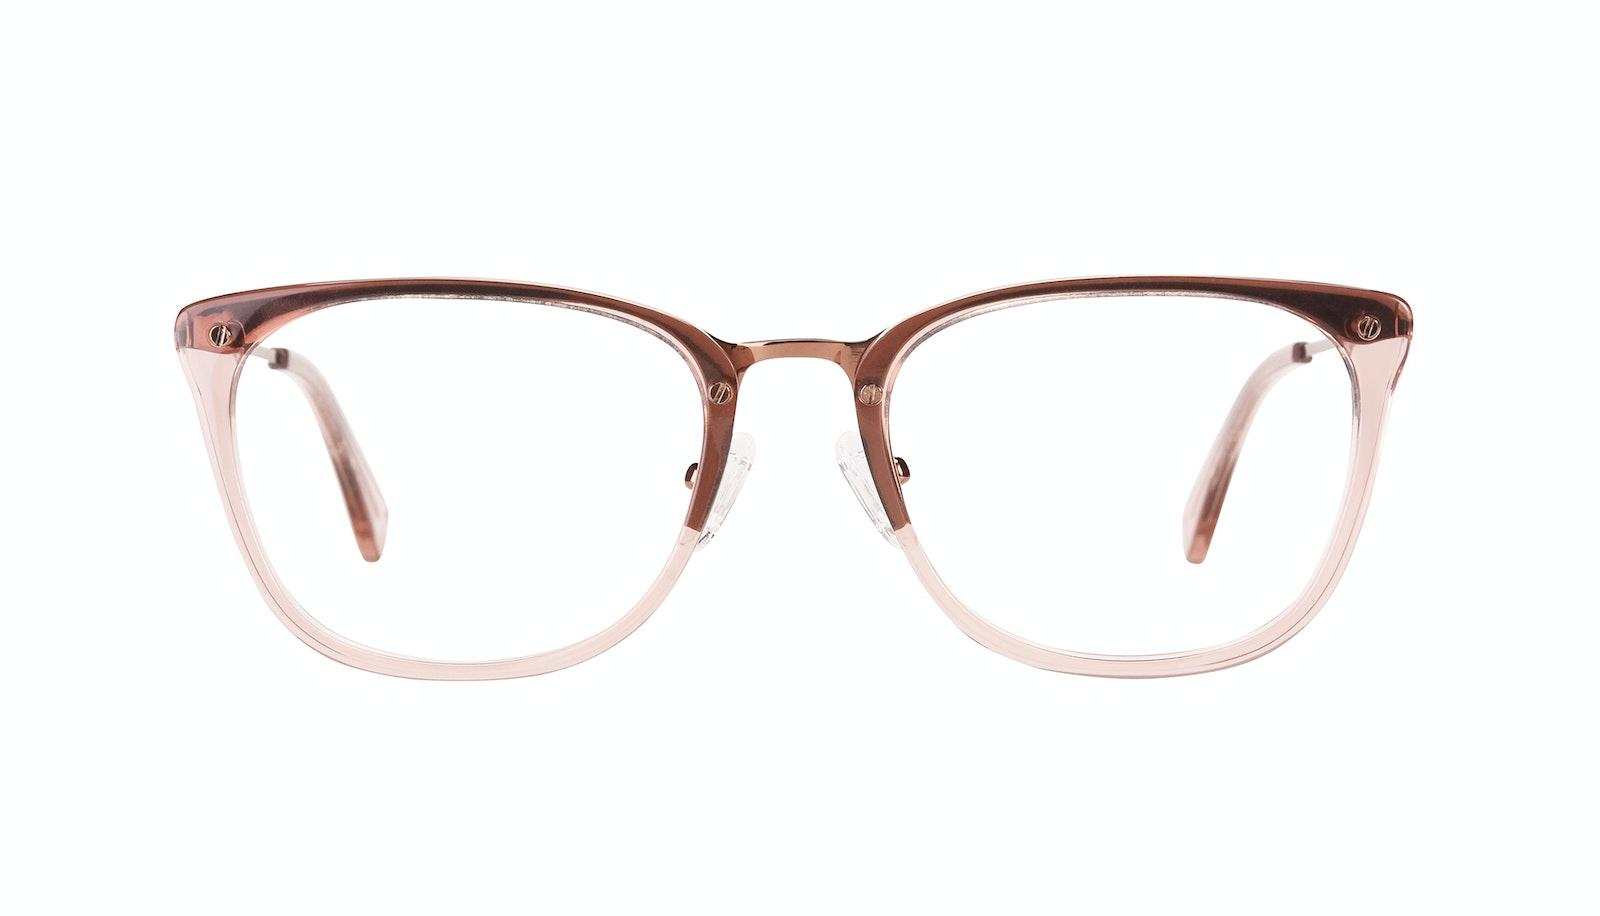 Affordable Fashion Glasses Rectangle Eyeglasses Women Wonder Rose